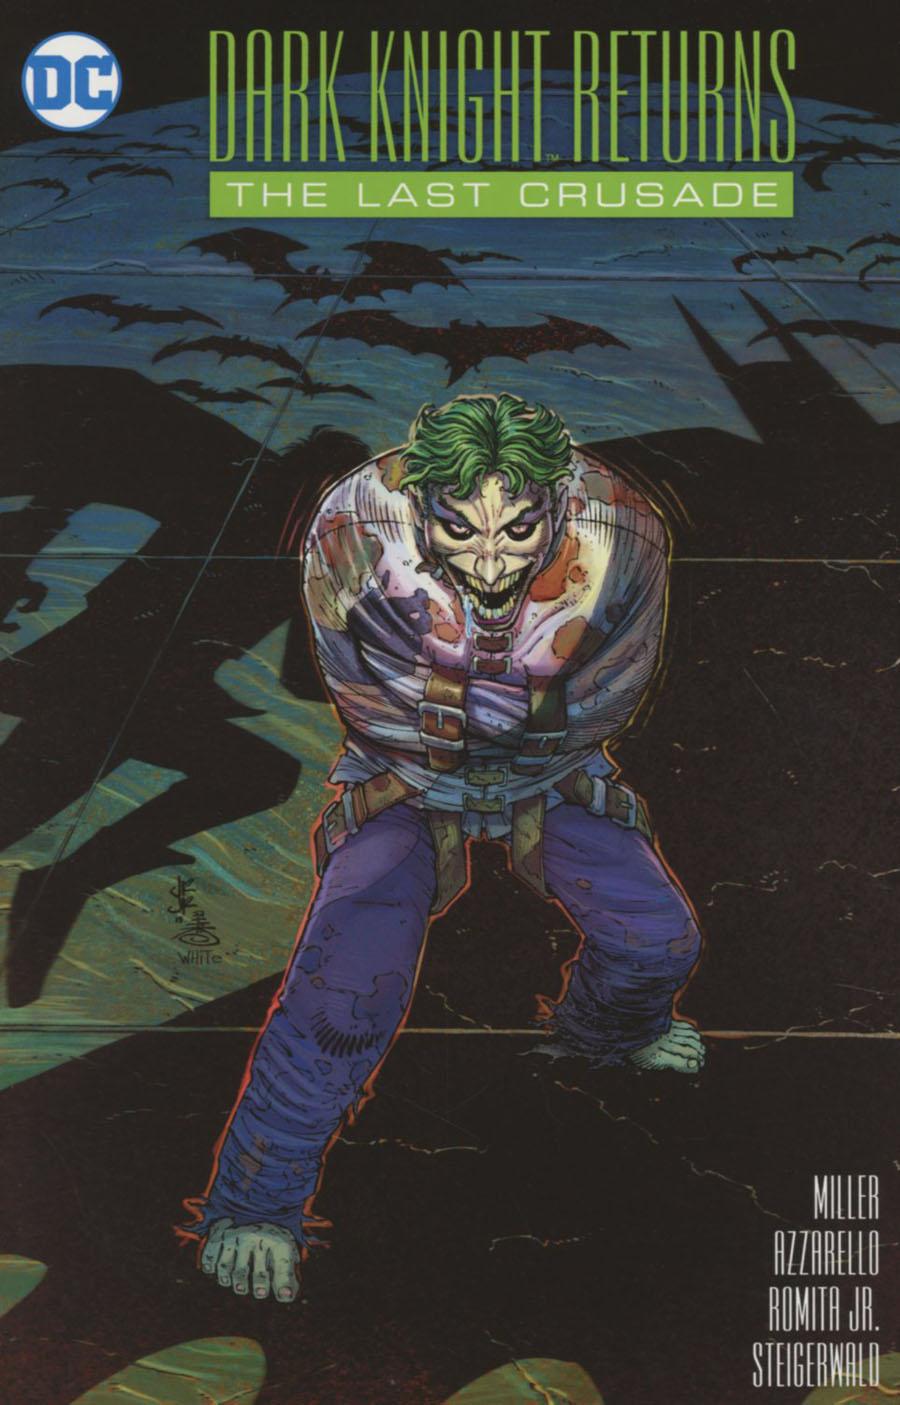 Dark Knight Returns The Last Crusade #1 Cover A Regular John Romita Jr Cover